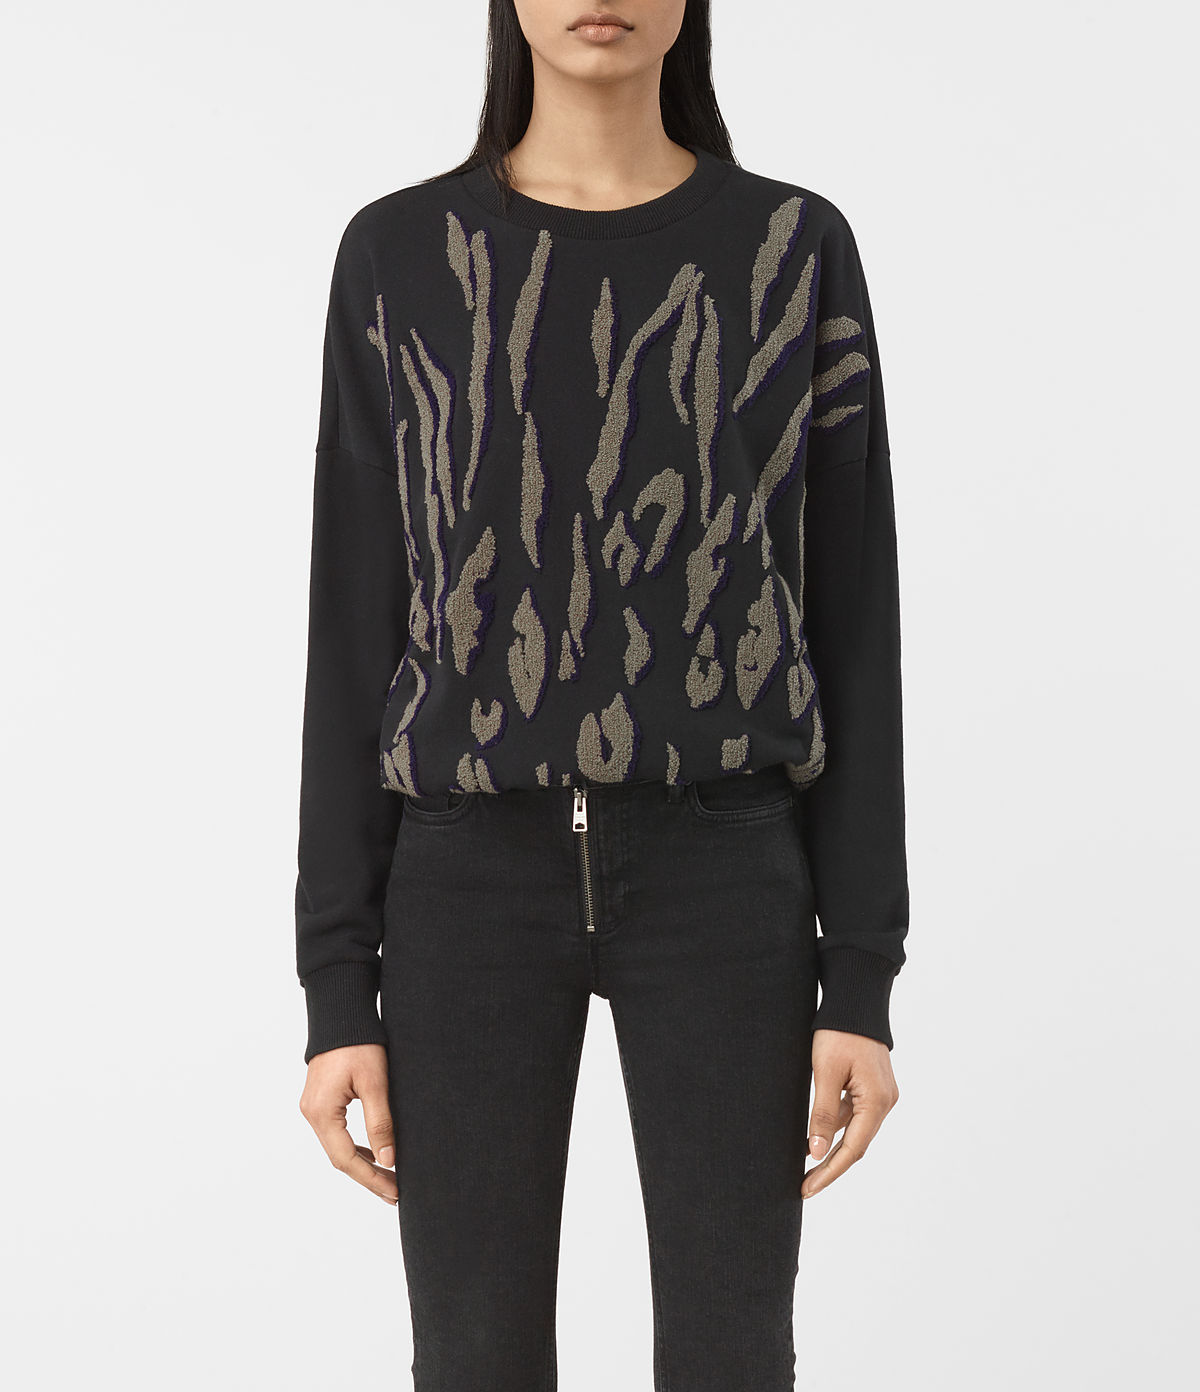 scar-embroidered-sweatshirt